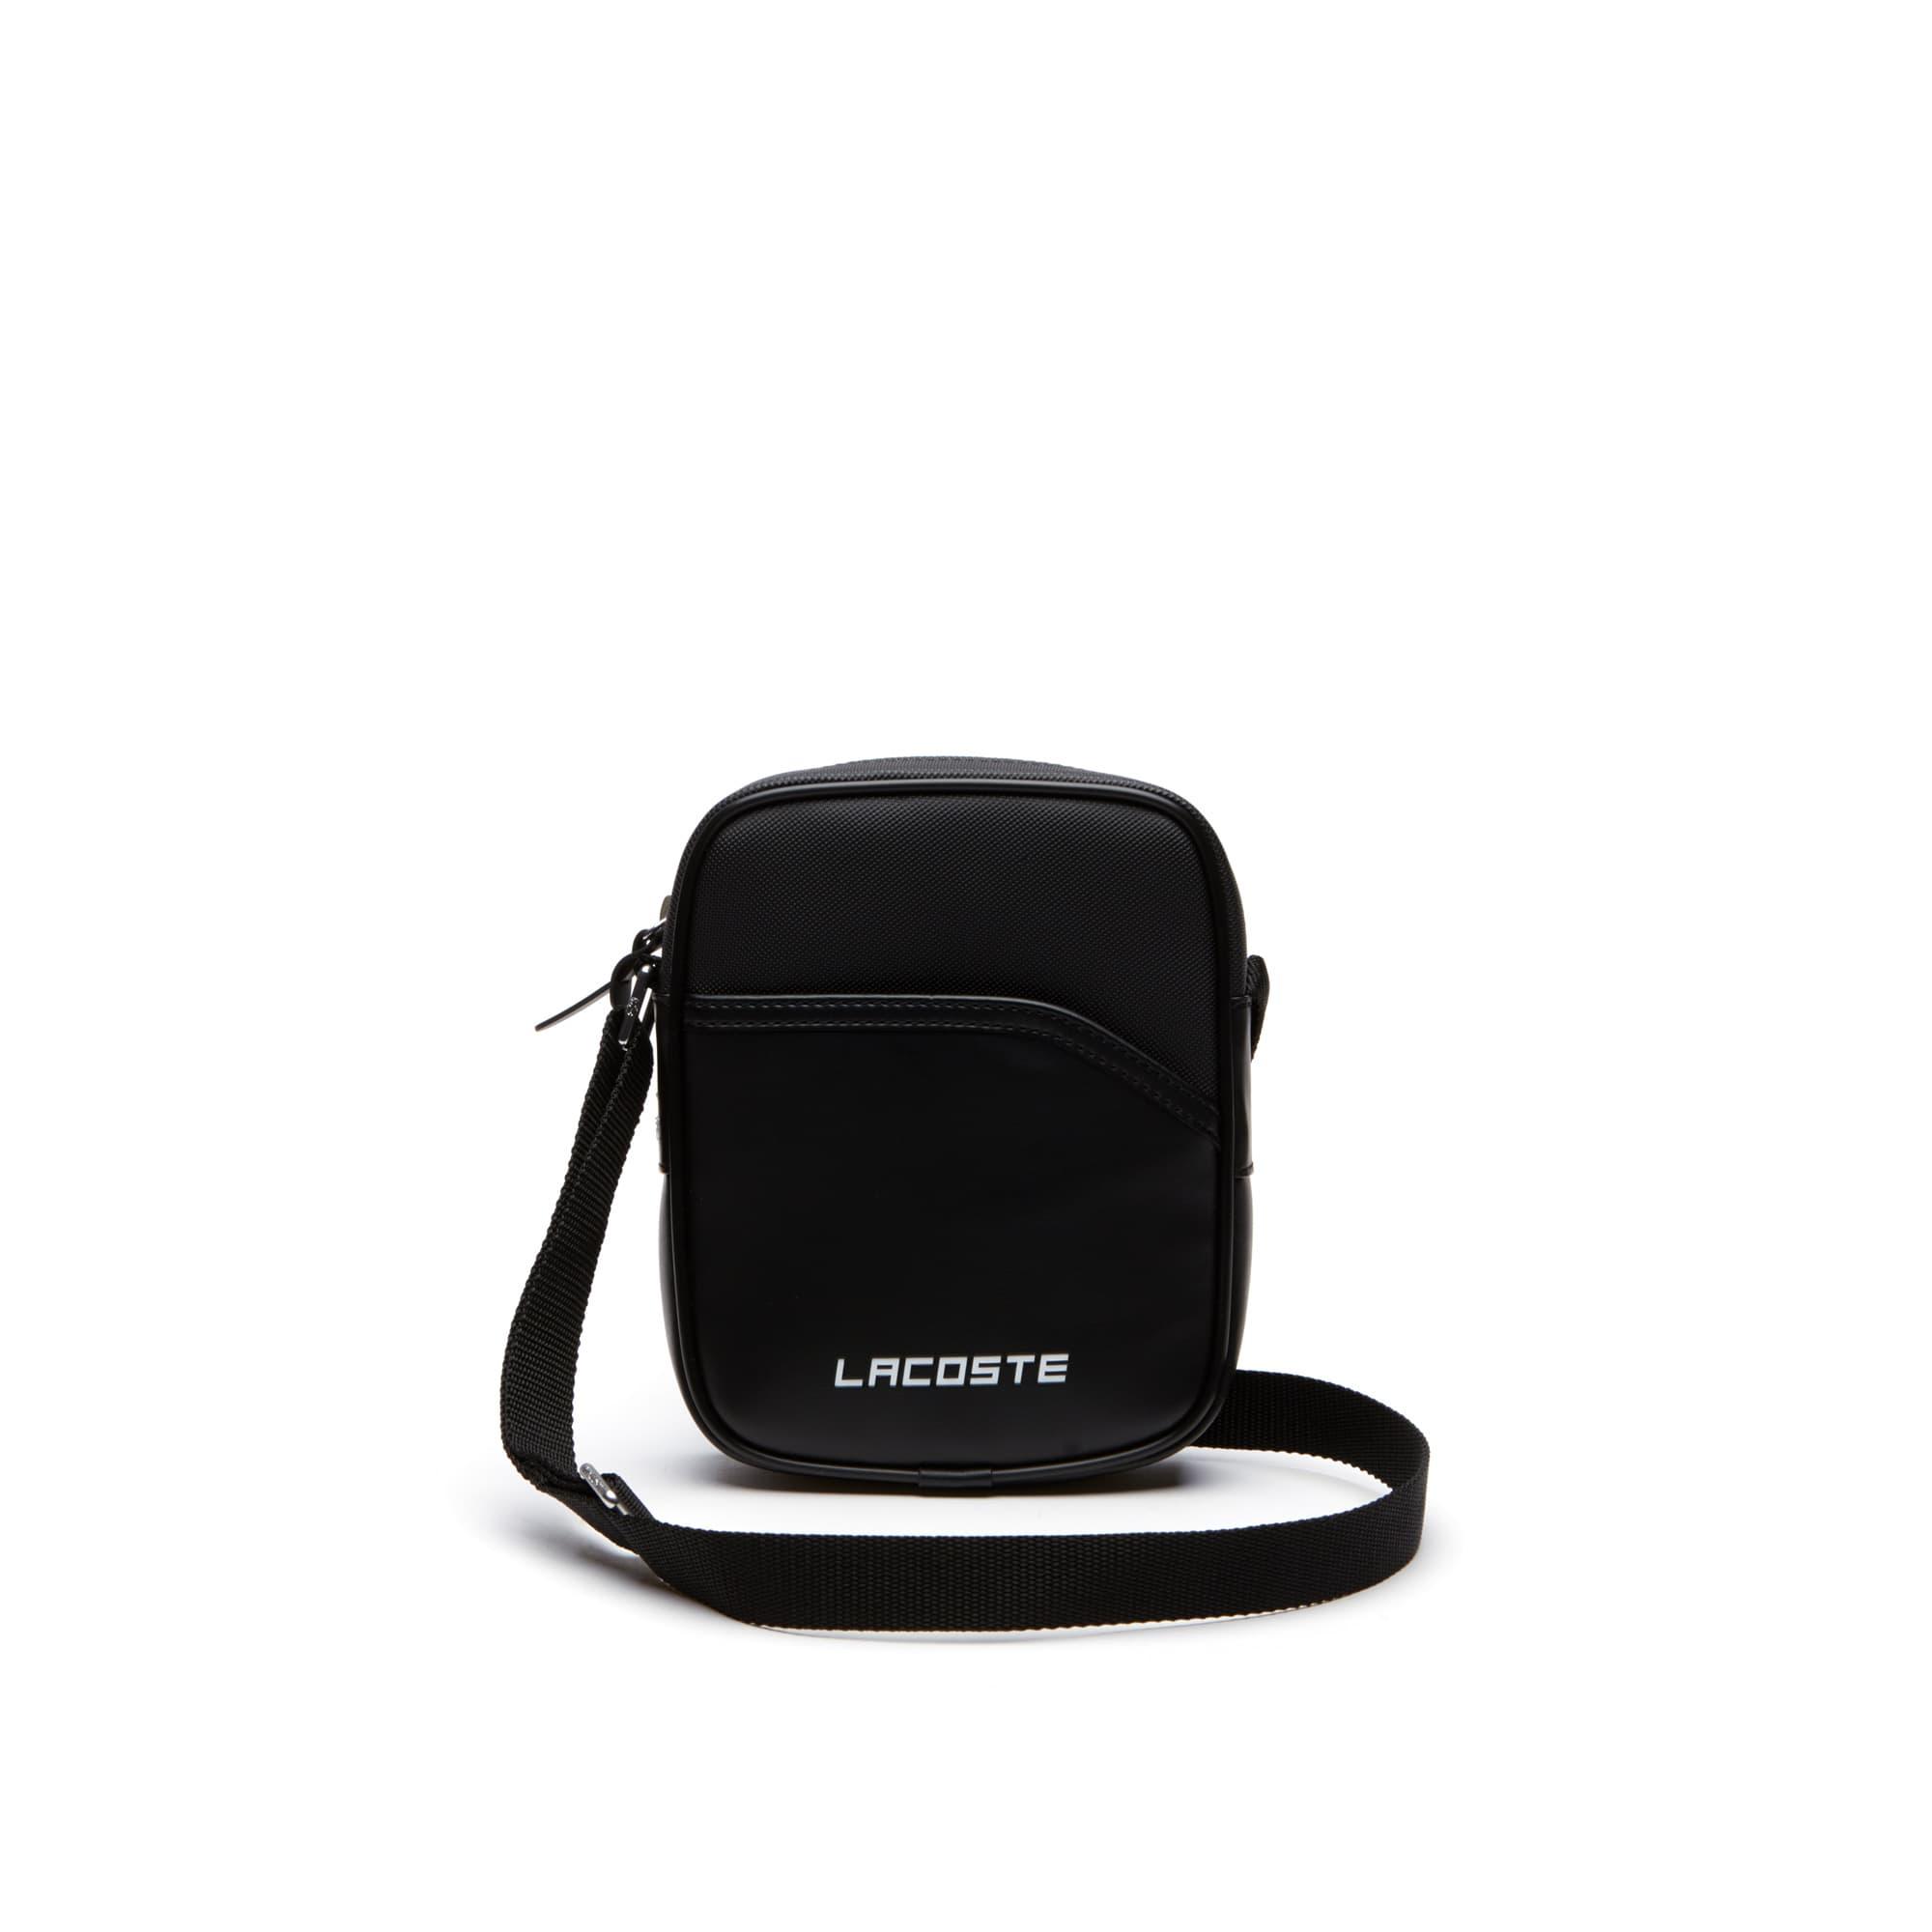 Mens 라코스테 Lacoste SPORT Ultimum 라코스테 Lacoste Lettering Vertical Bag,BLACK